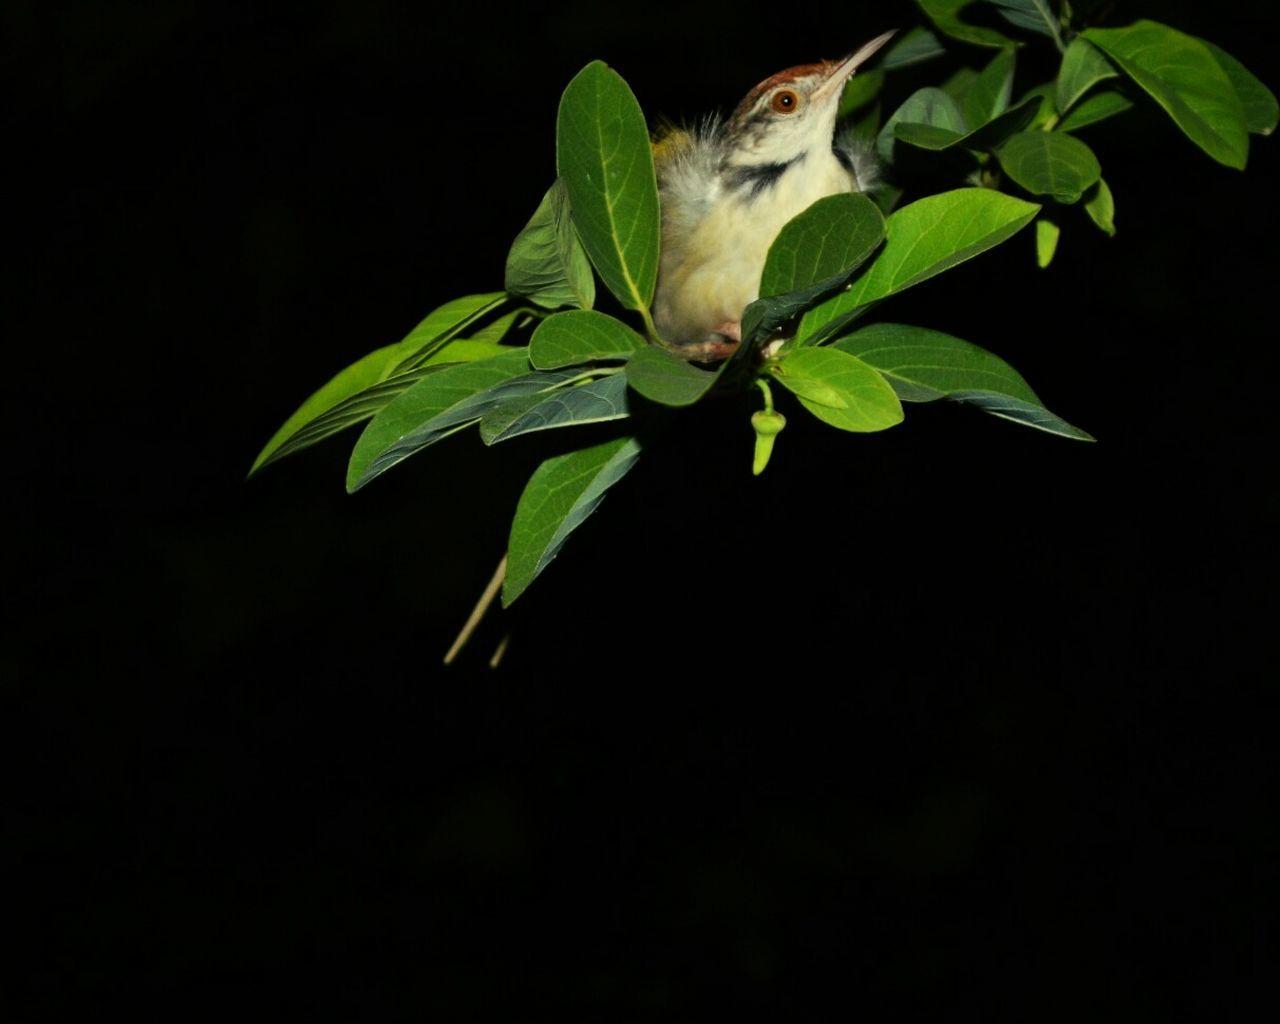 Bird Photography Beauty In Nature Nature Selective Focus Closeup Shots Life Plant Birds Of EyeEm  Birds_n_branches Birdie Nightphotography Nightshot darkness and light